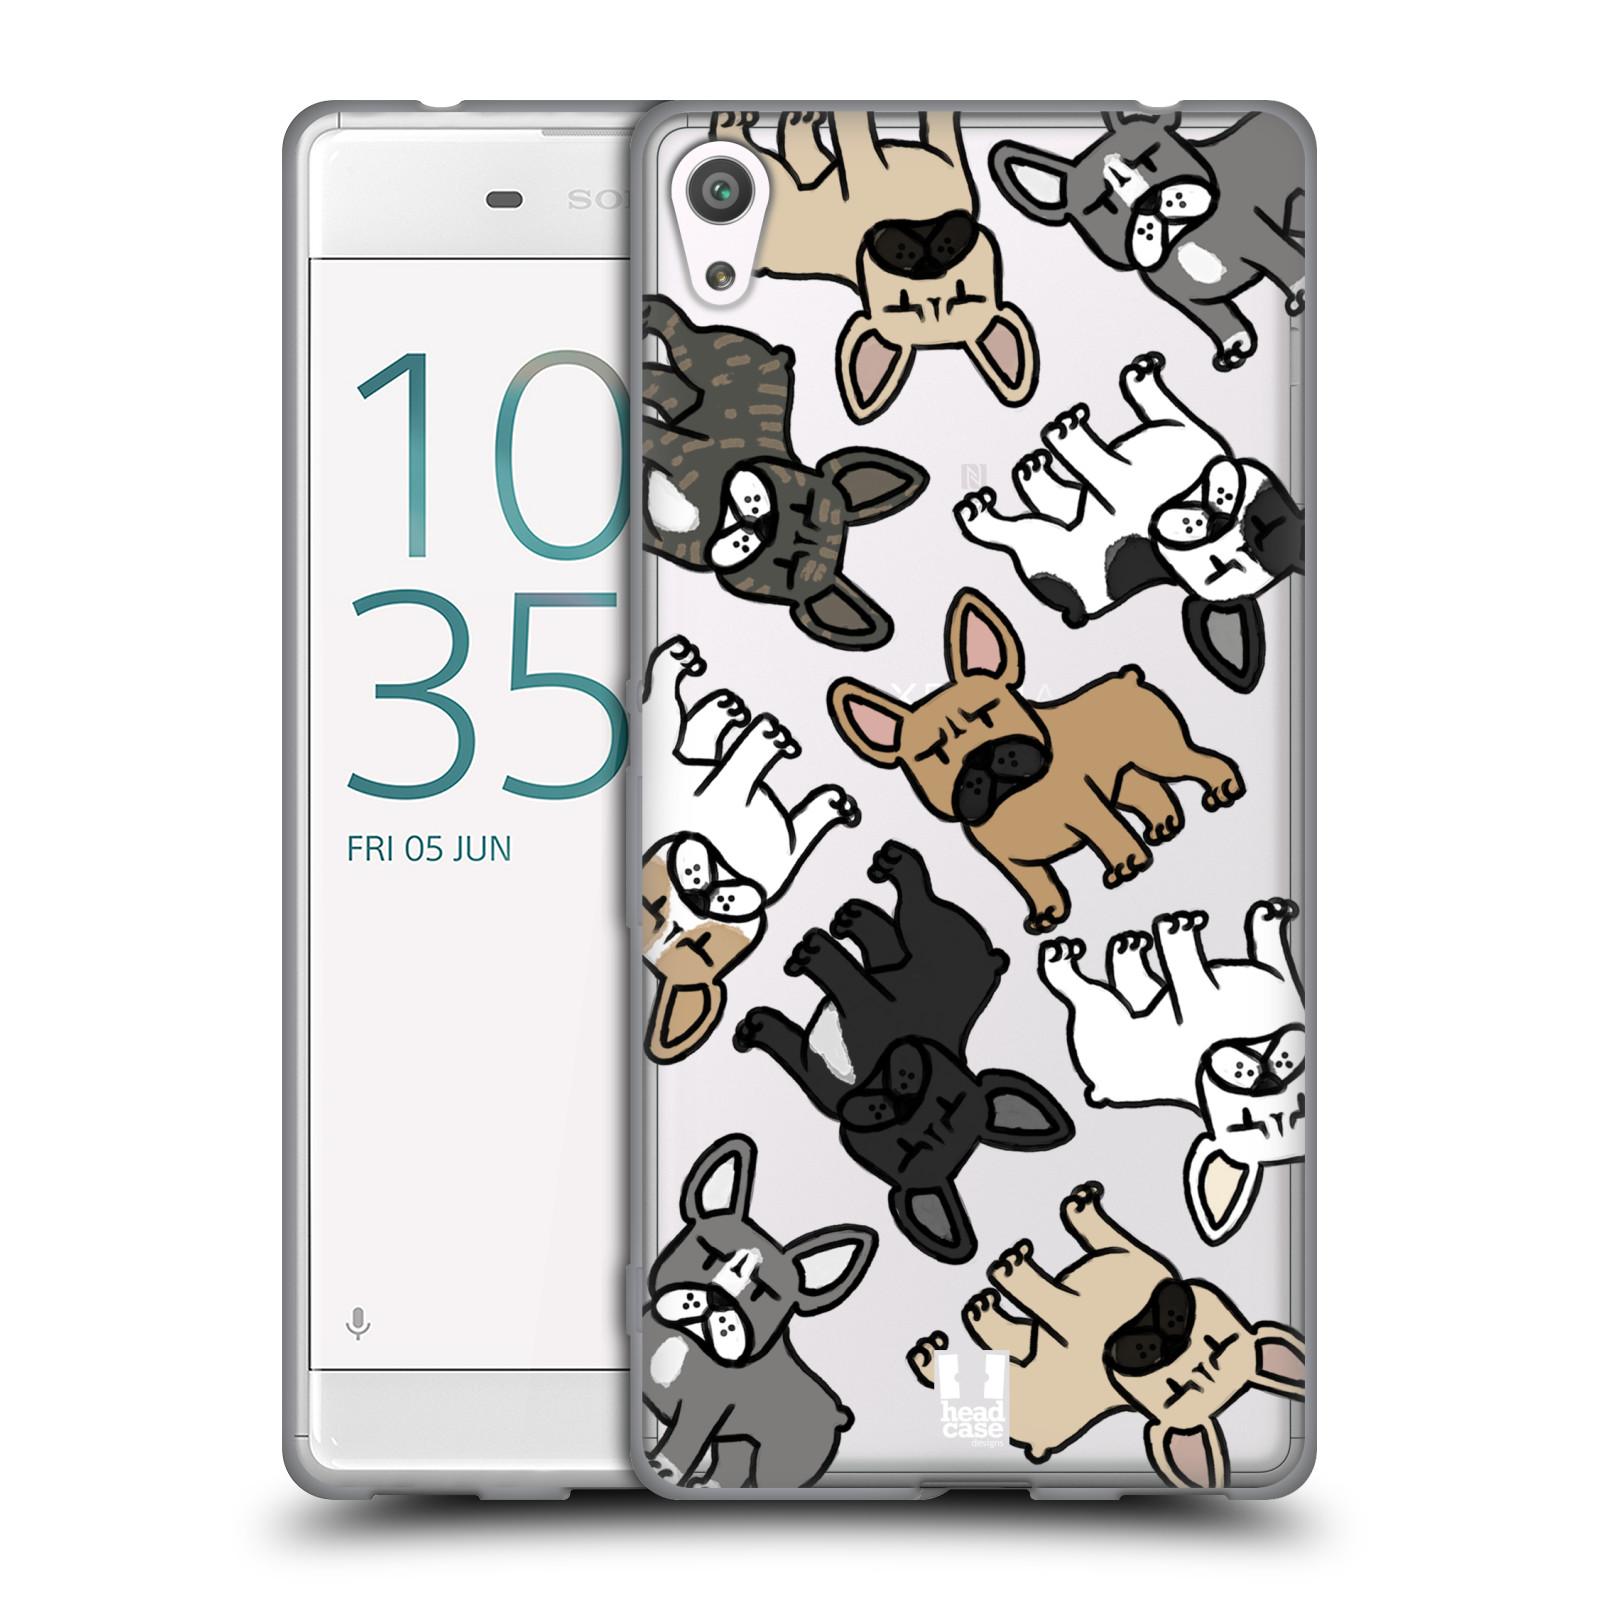 HEAD CASE silikonový obal na mobil Sony Xperia XA ULTRA pejsek francouzský buldog